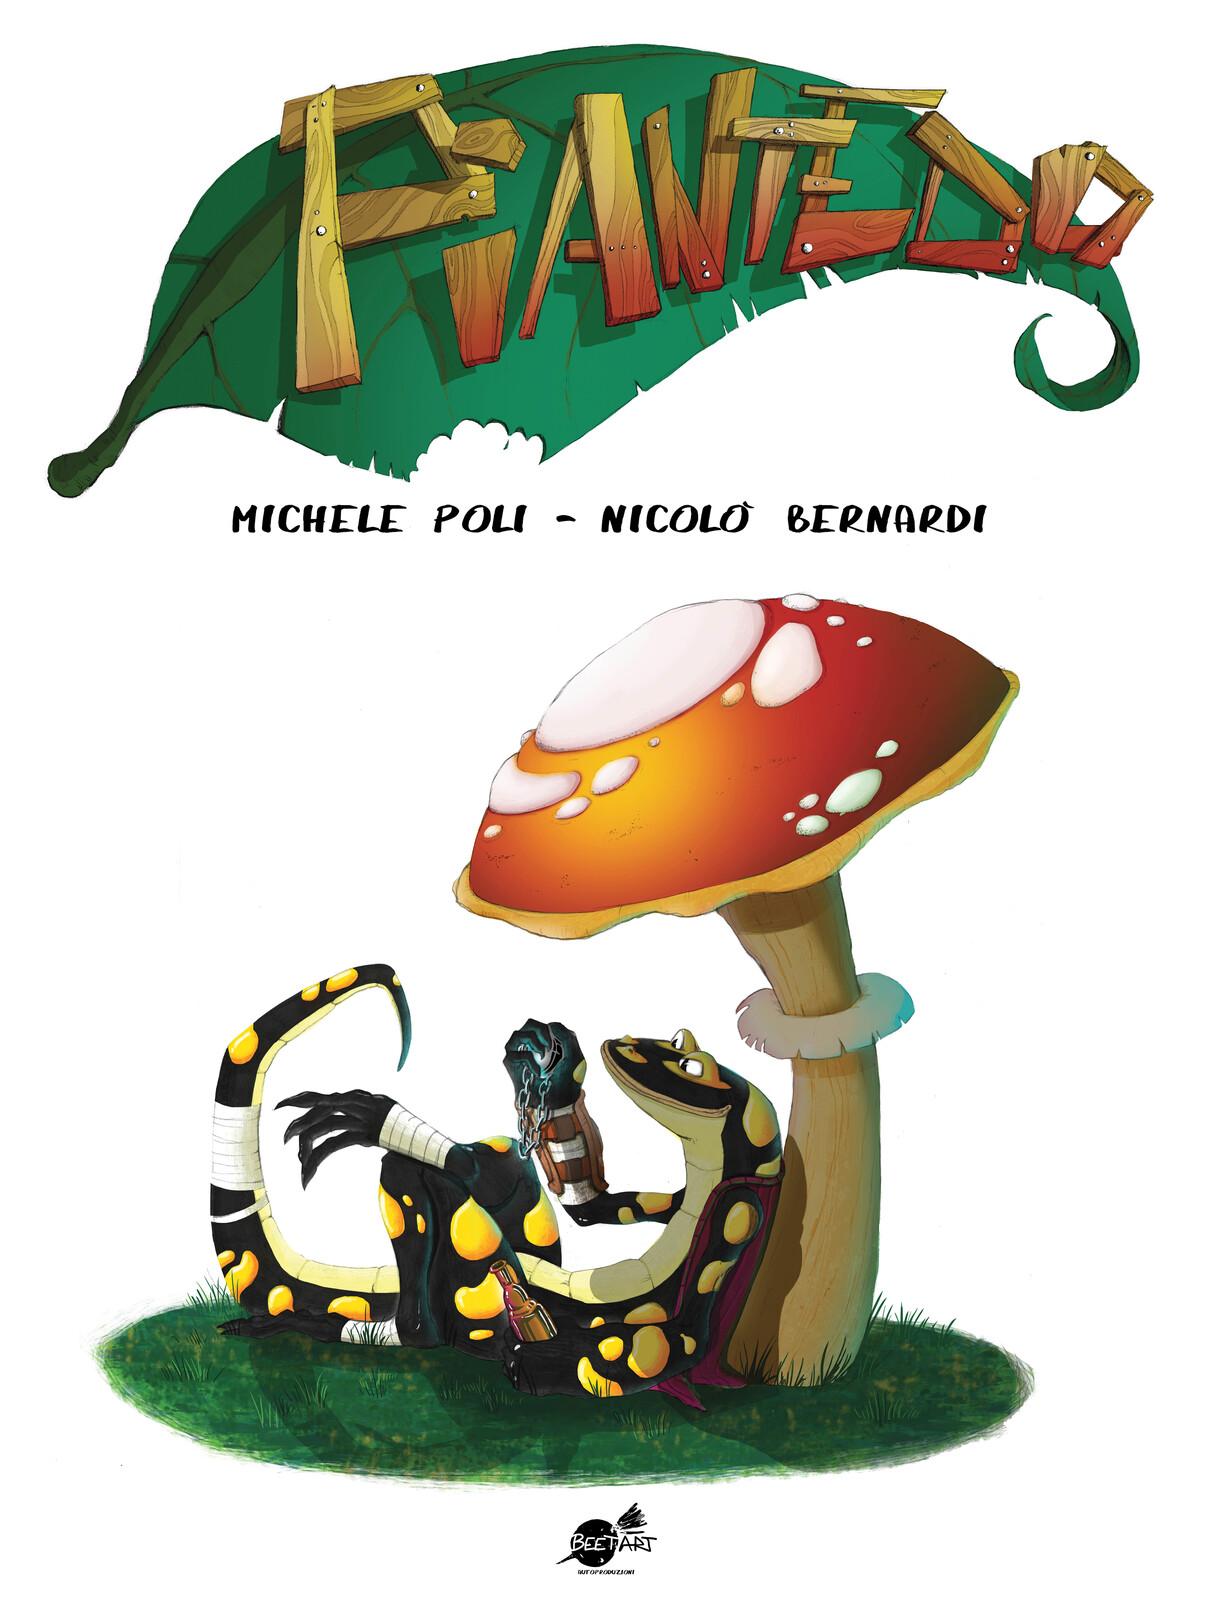 Piantedo - Michele Poli and Nicolò Bernardi, Beetart Autoproductions.  A thief salamander, a grumpy poacher, a fallen prince. Are you ready?